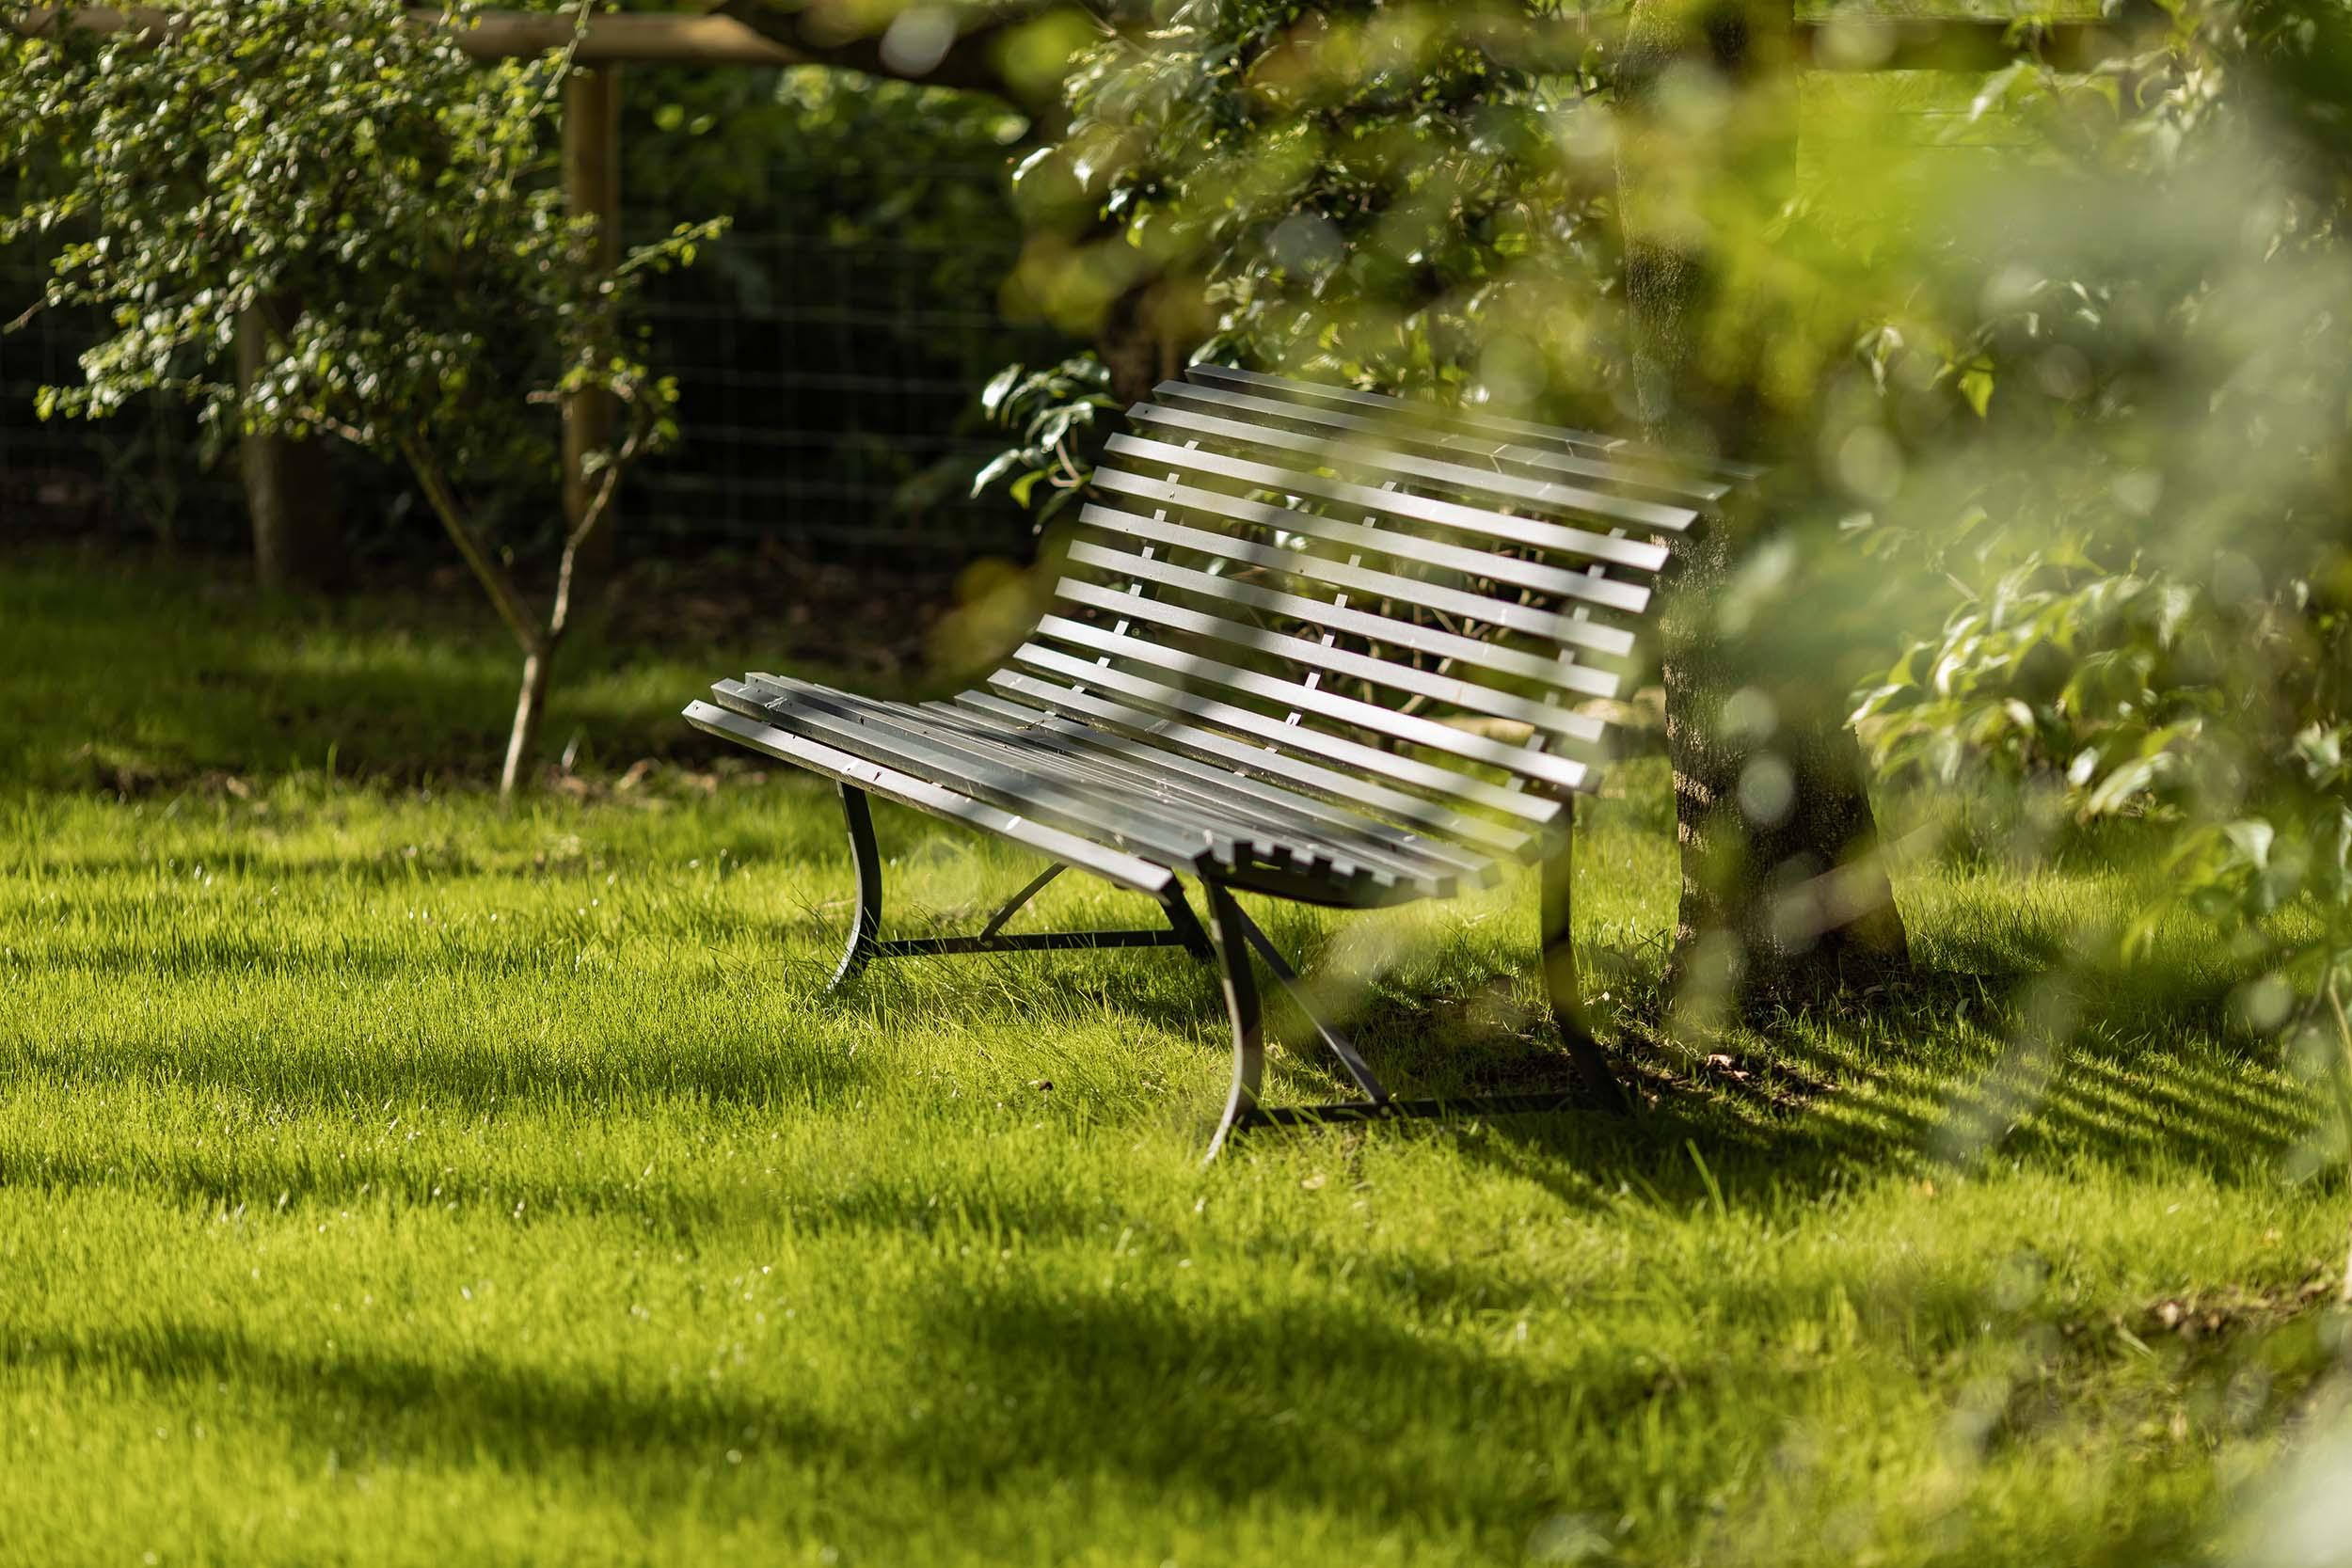 Nicholsons Garden - Lockdown For The Grandchildren 9